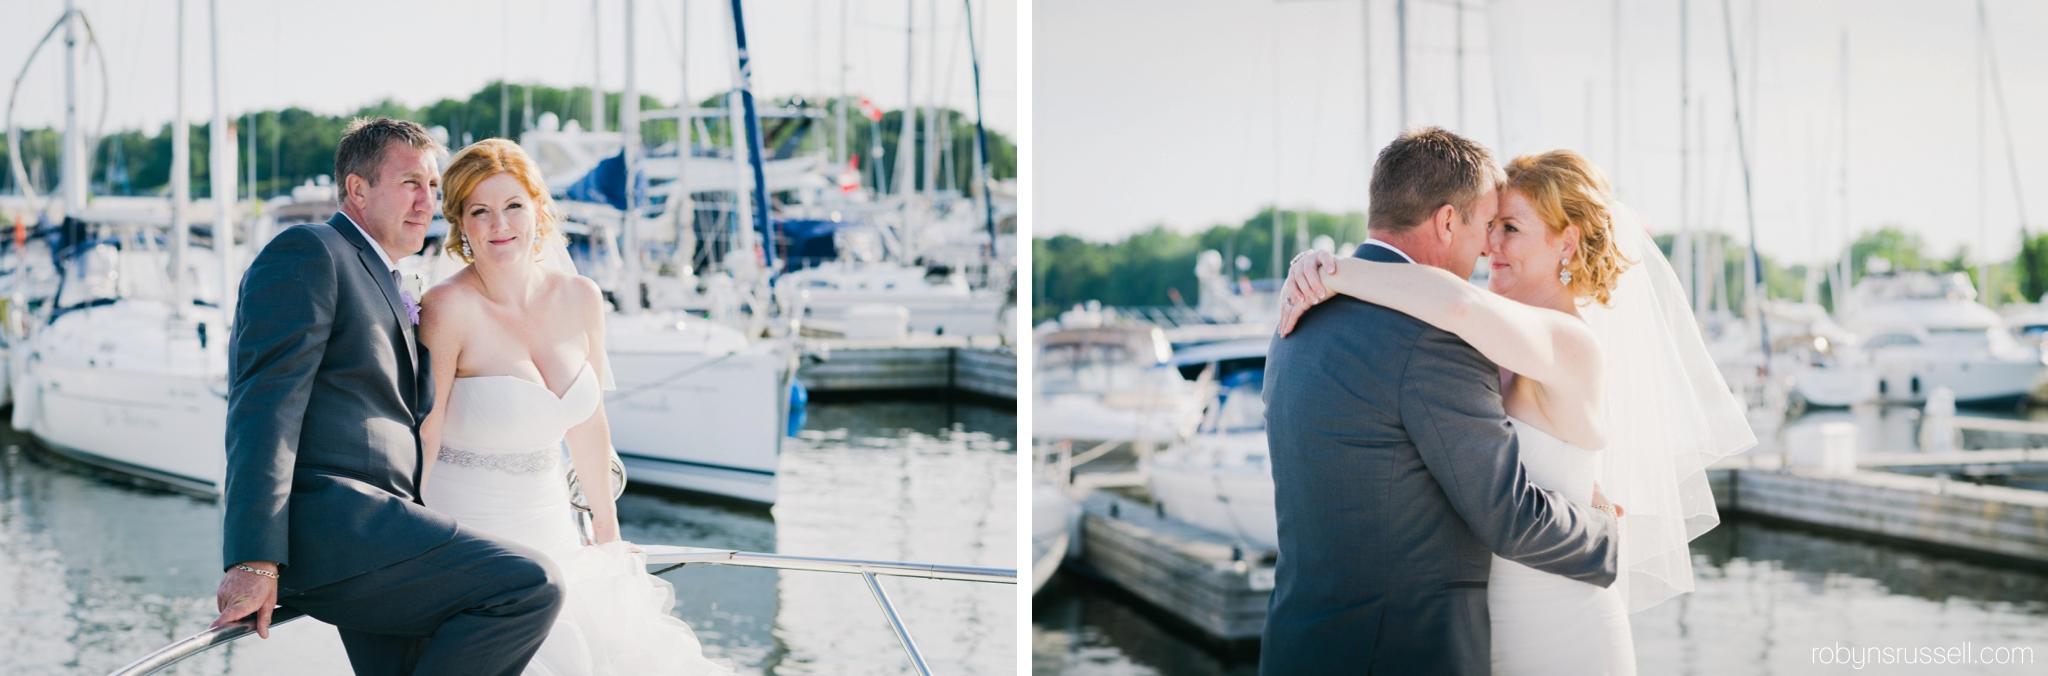 25-beautiful-wedded-couple-oakville-wedding-photographer.jpg